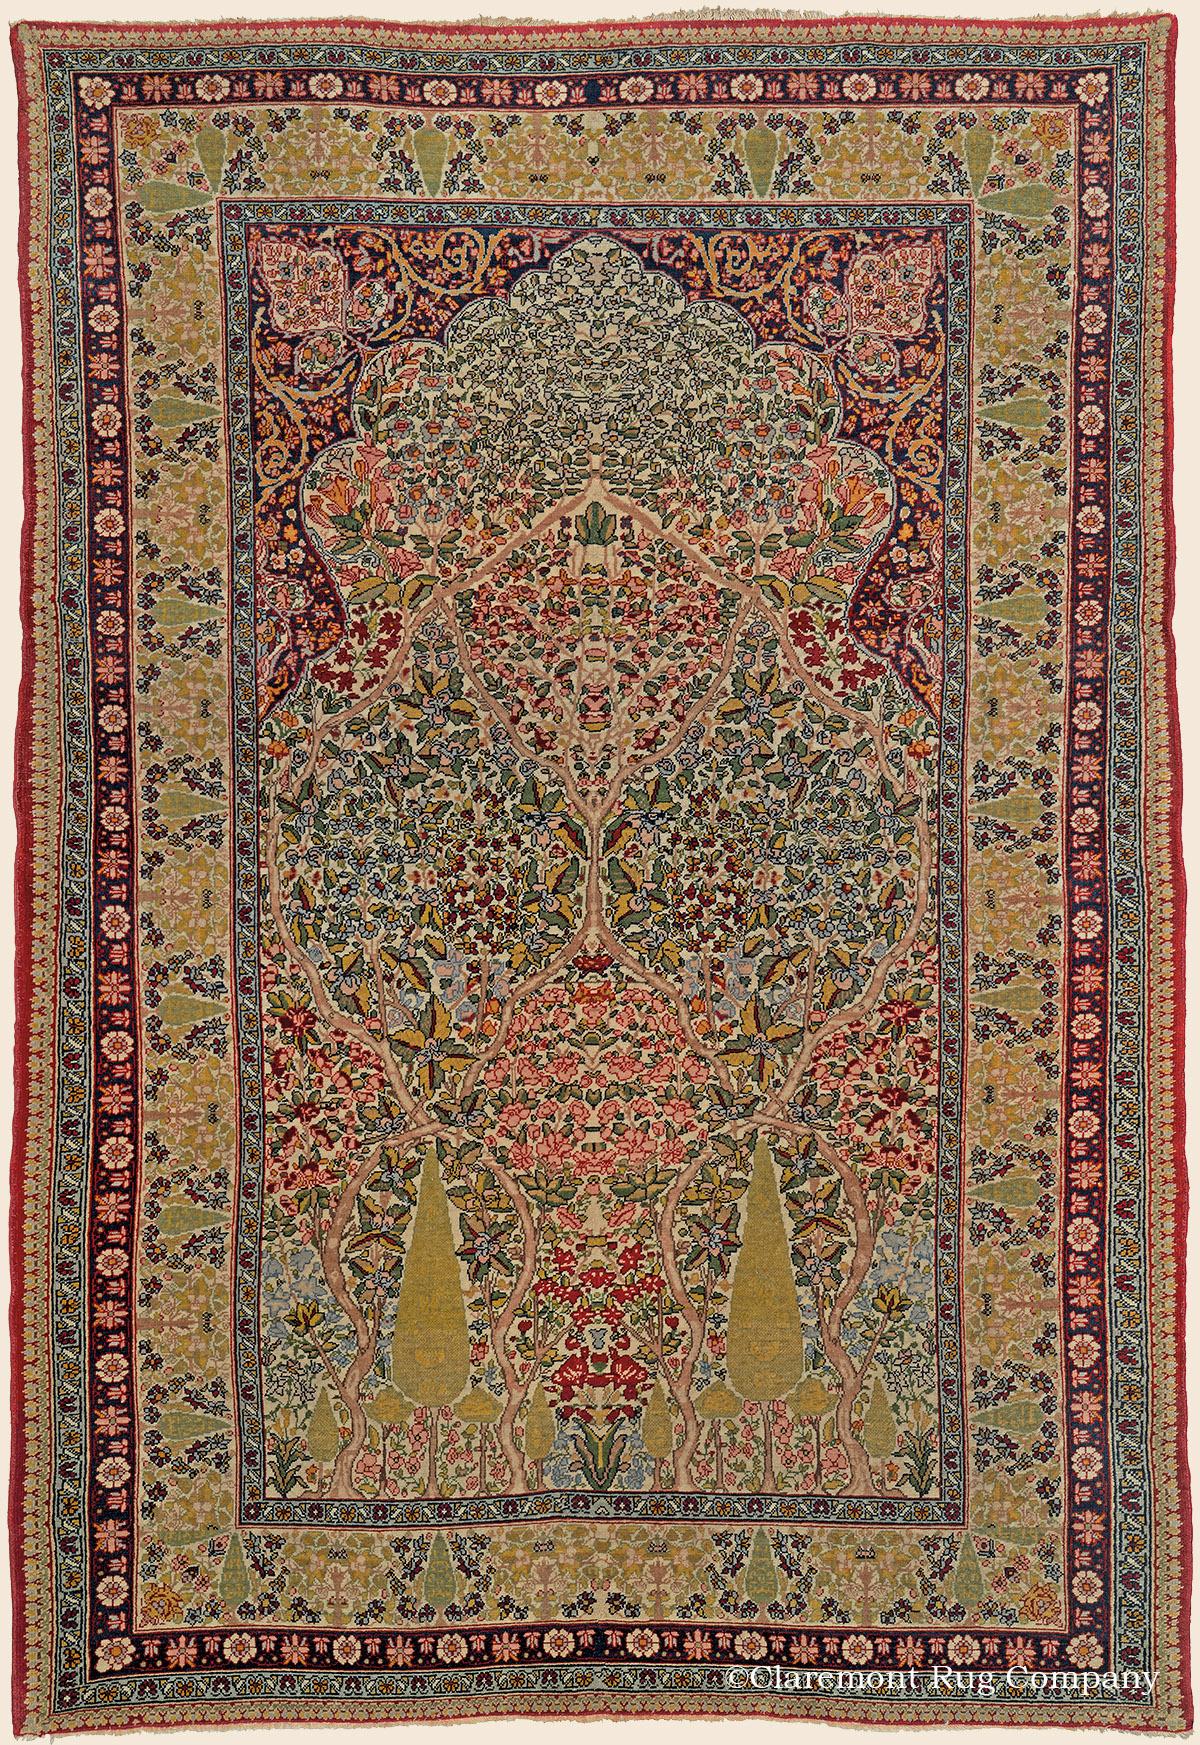 Laver Kirman Quot Tree Of Life Quot Southeast Persian Antique Rug